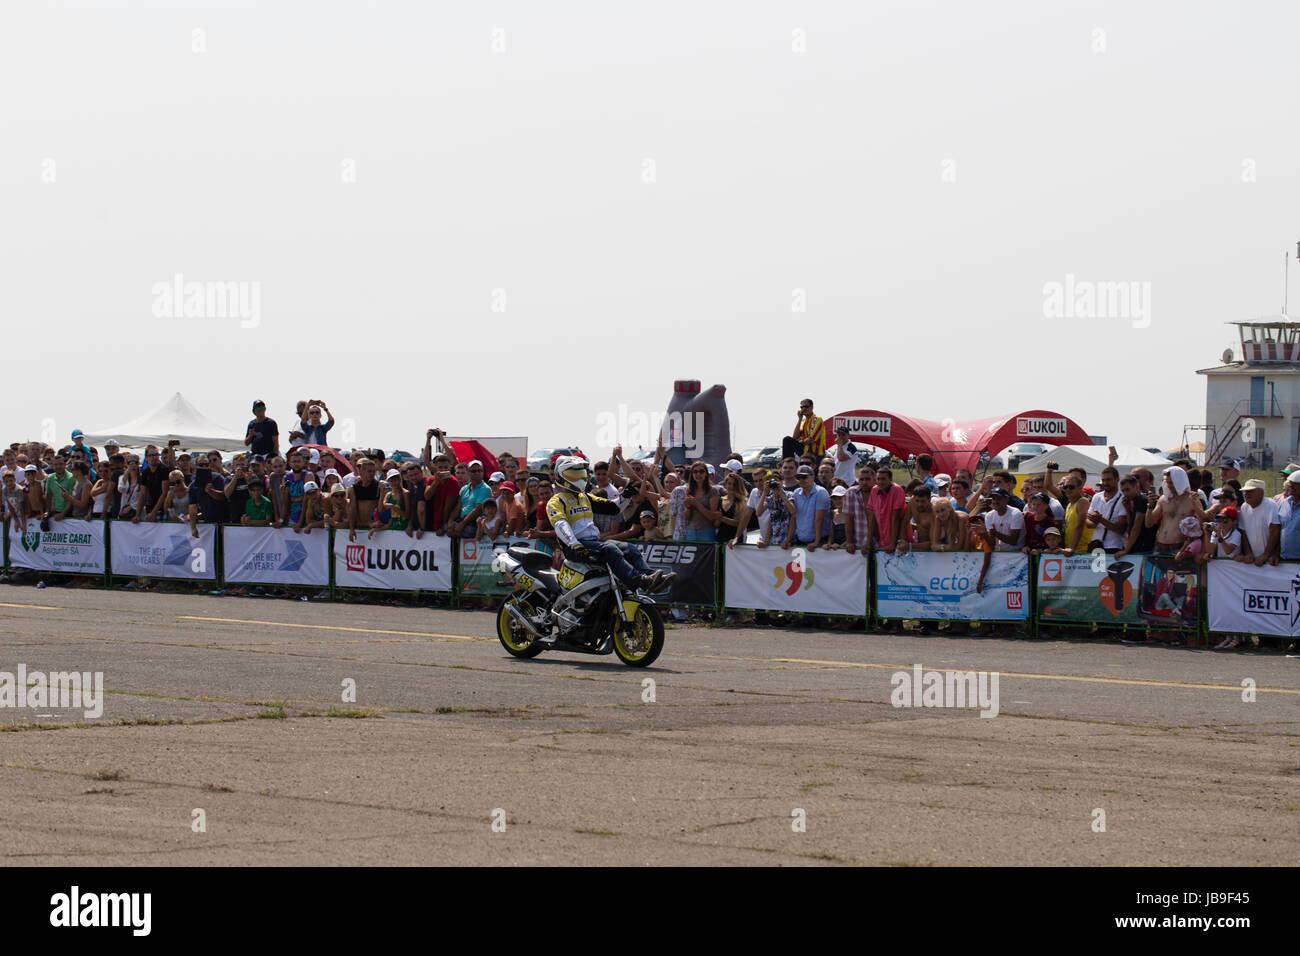 BMW Festival in Chisinau Republic of Moldova July 30 2016. Motorbike show Attila. - Stock Image